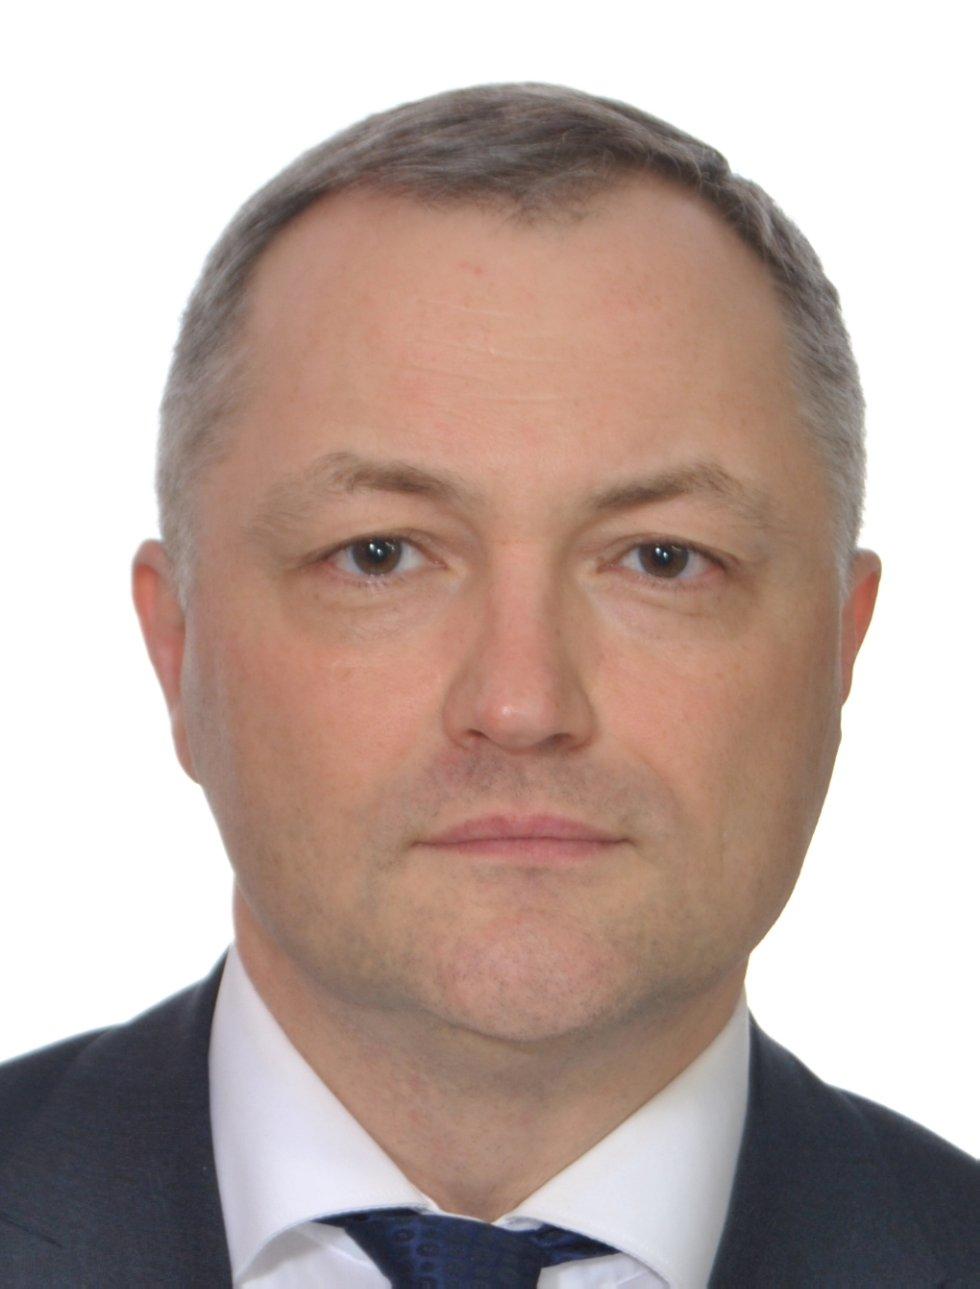 Arslanov Kamil Maratovich